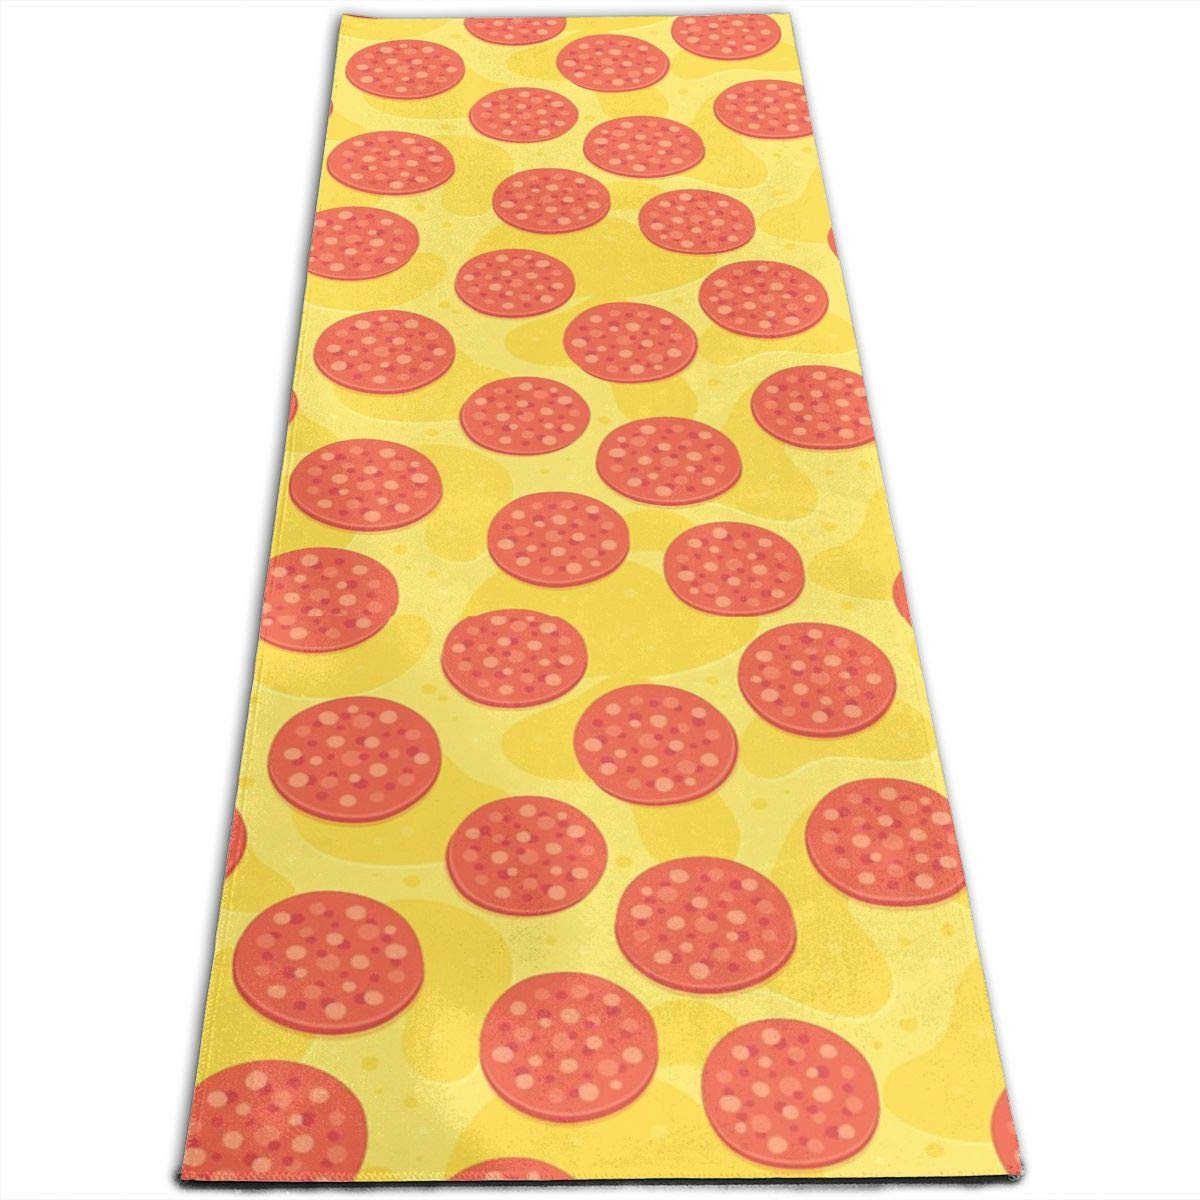 Amazon.com: Pepperoni Pizza Pattern Printed Yoga Mat Prana ...